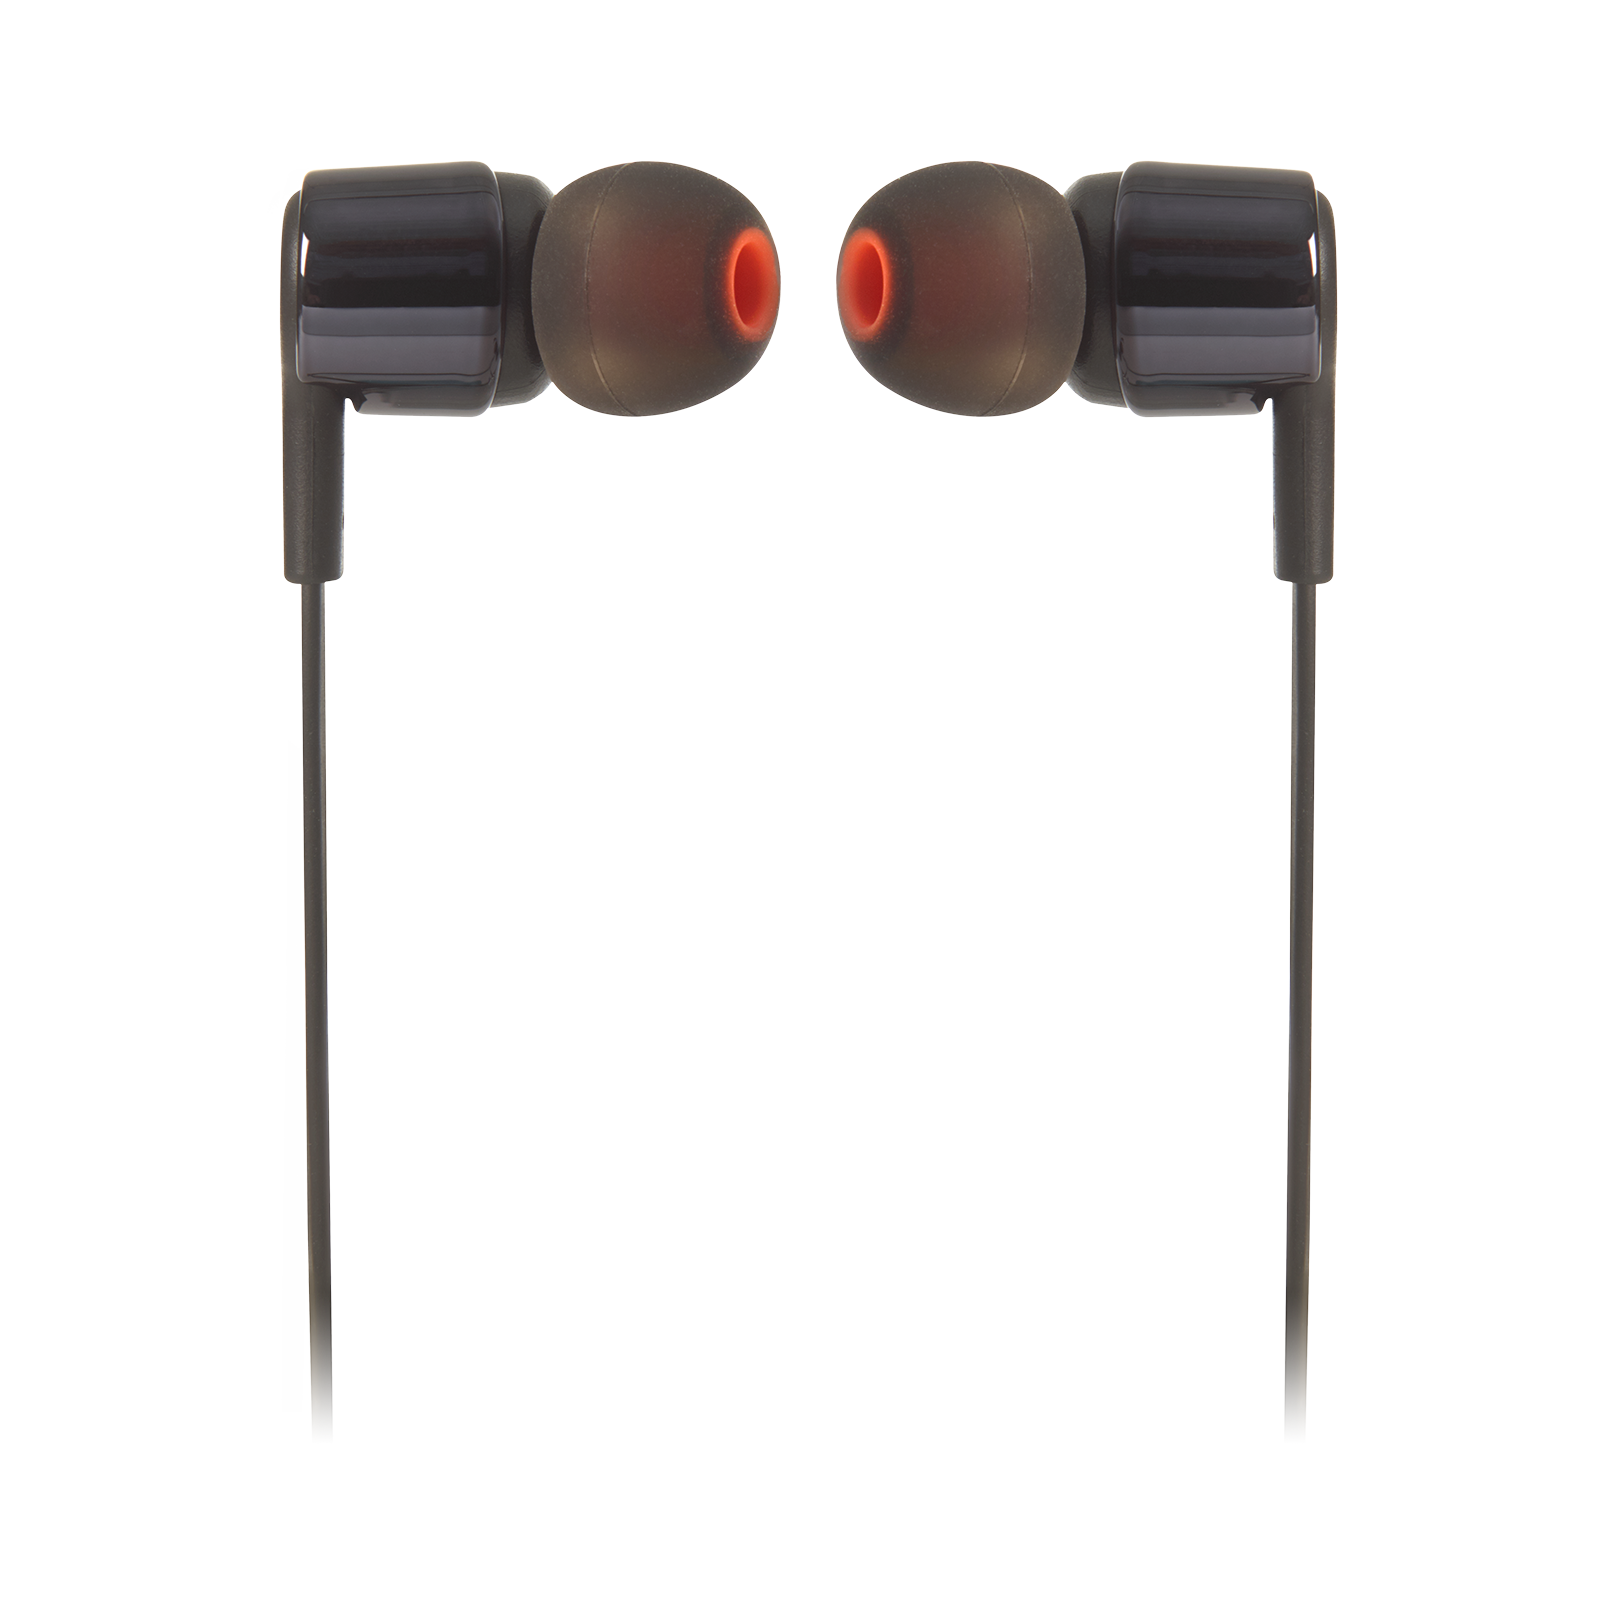 Jbl T210 In Ear Headphones Reflect Response Sport Bluetooth Headphone Hitam